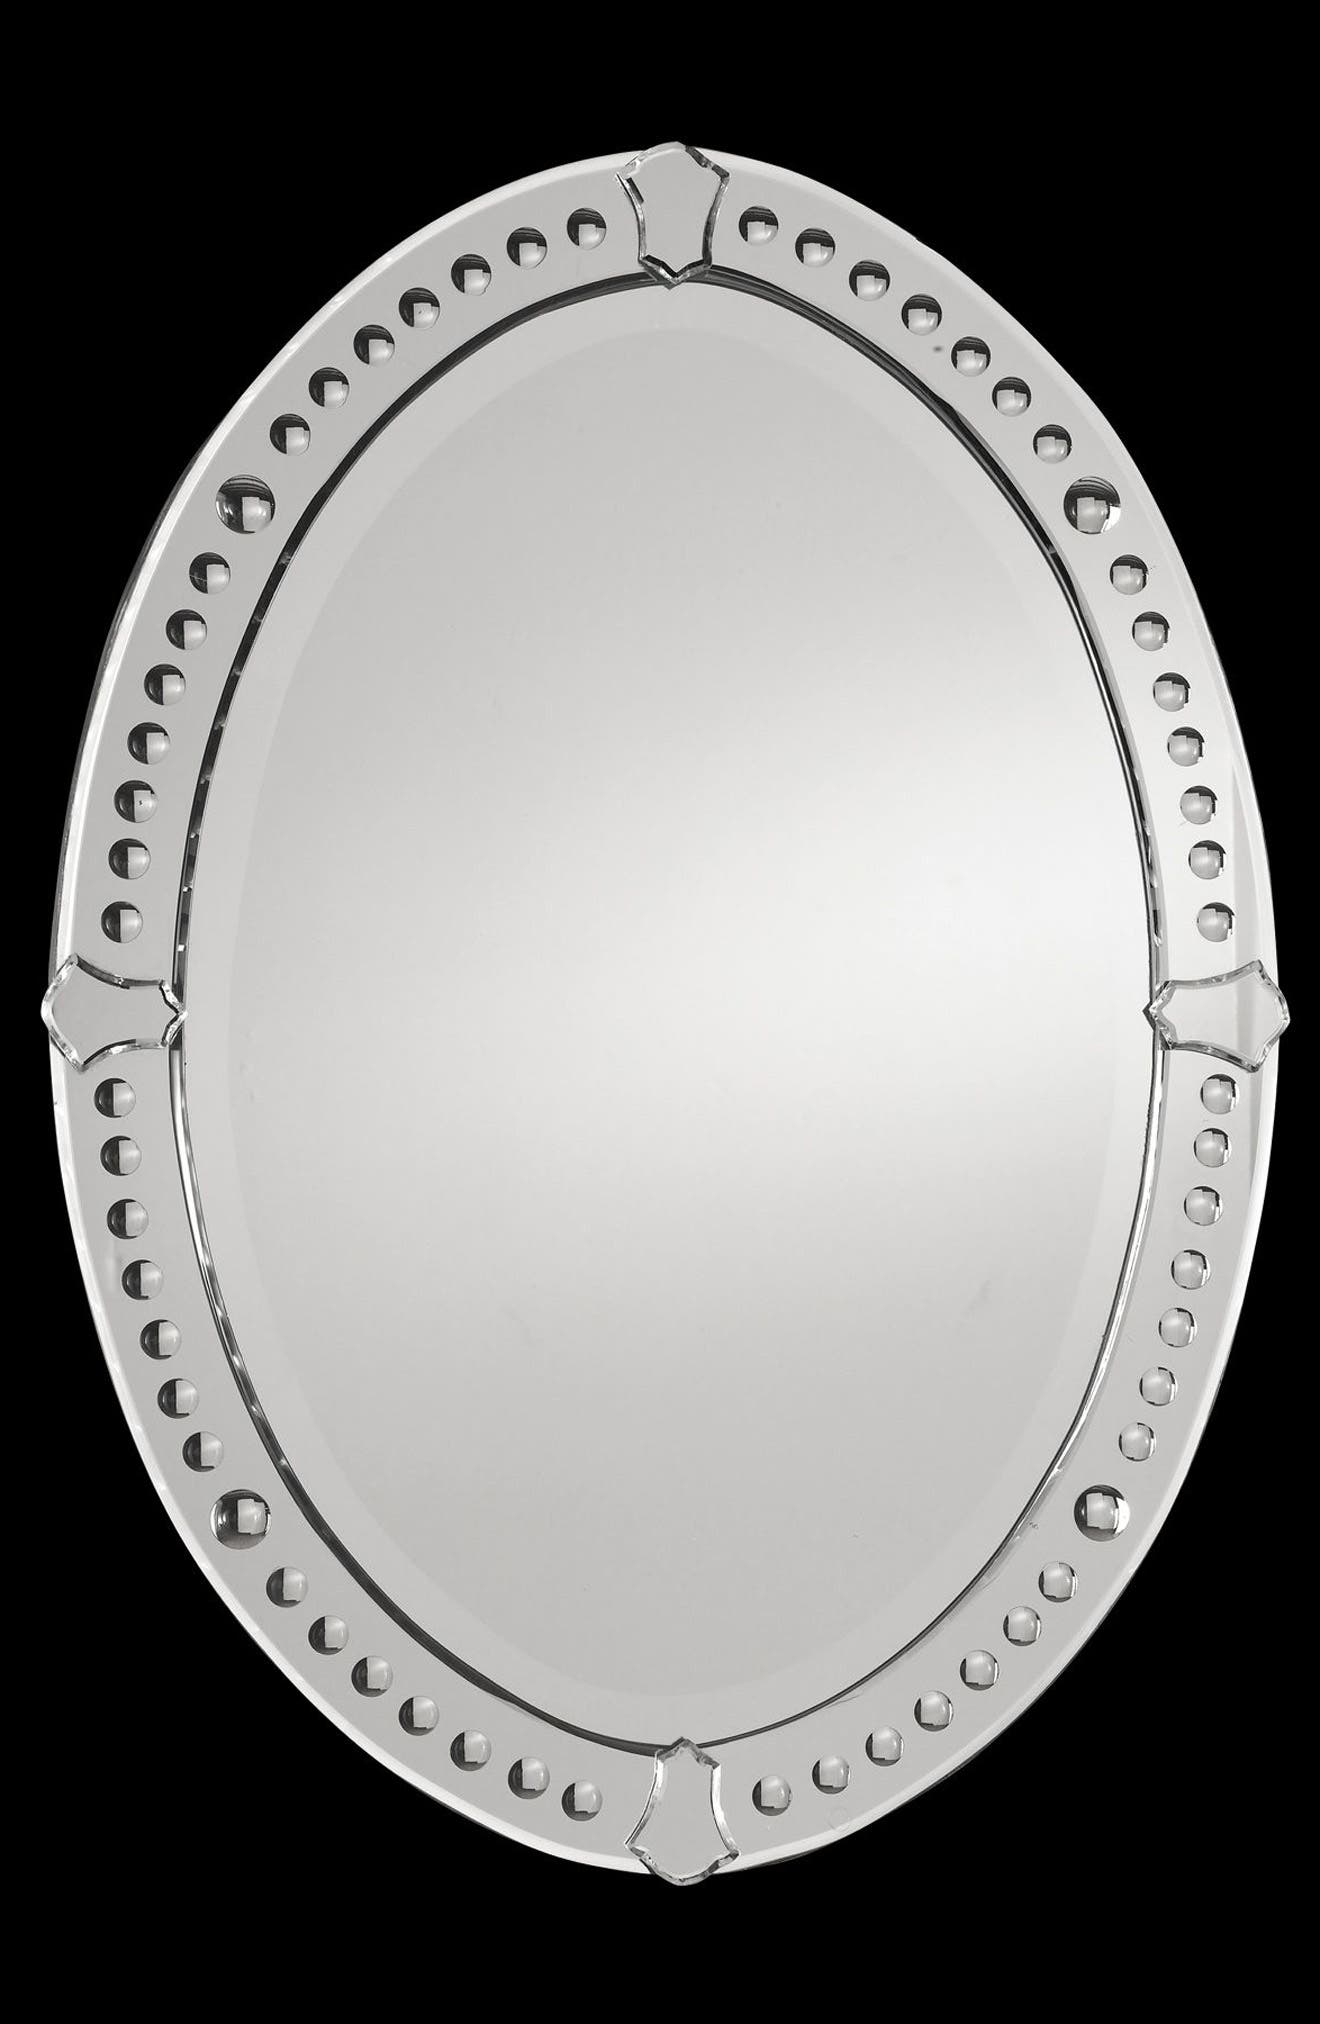 'Graziano' Frameless Oval Mirror,                             Alternate thumbnail 2, color,                             200